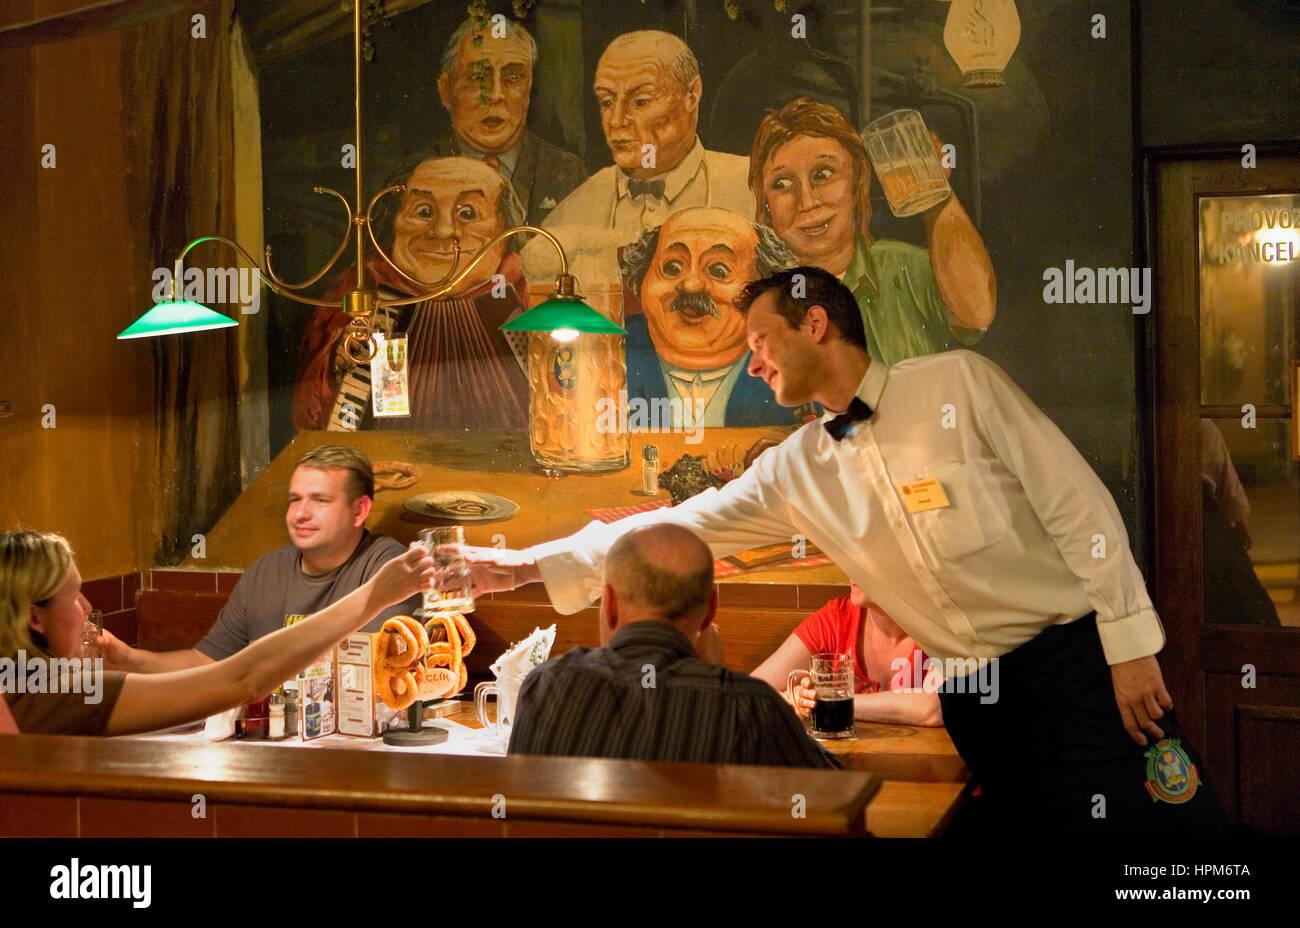 Pivovar. Brewery restaurant.20, Vodickova street.Prague. Czech Republic - Stock Image